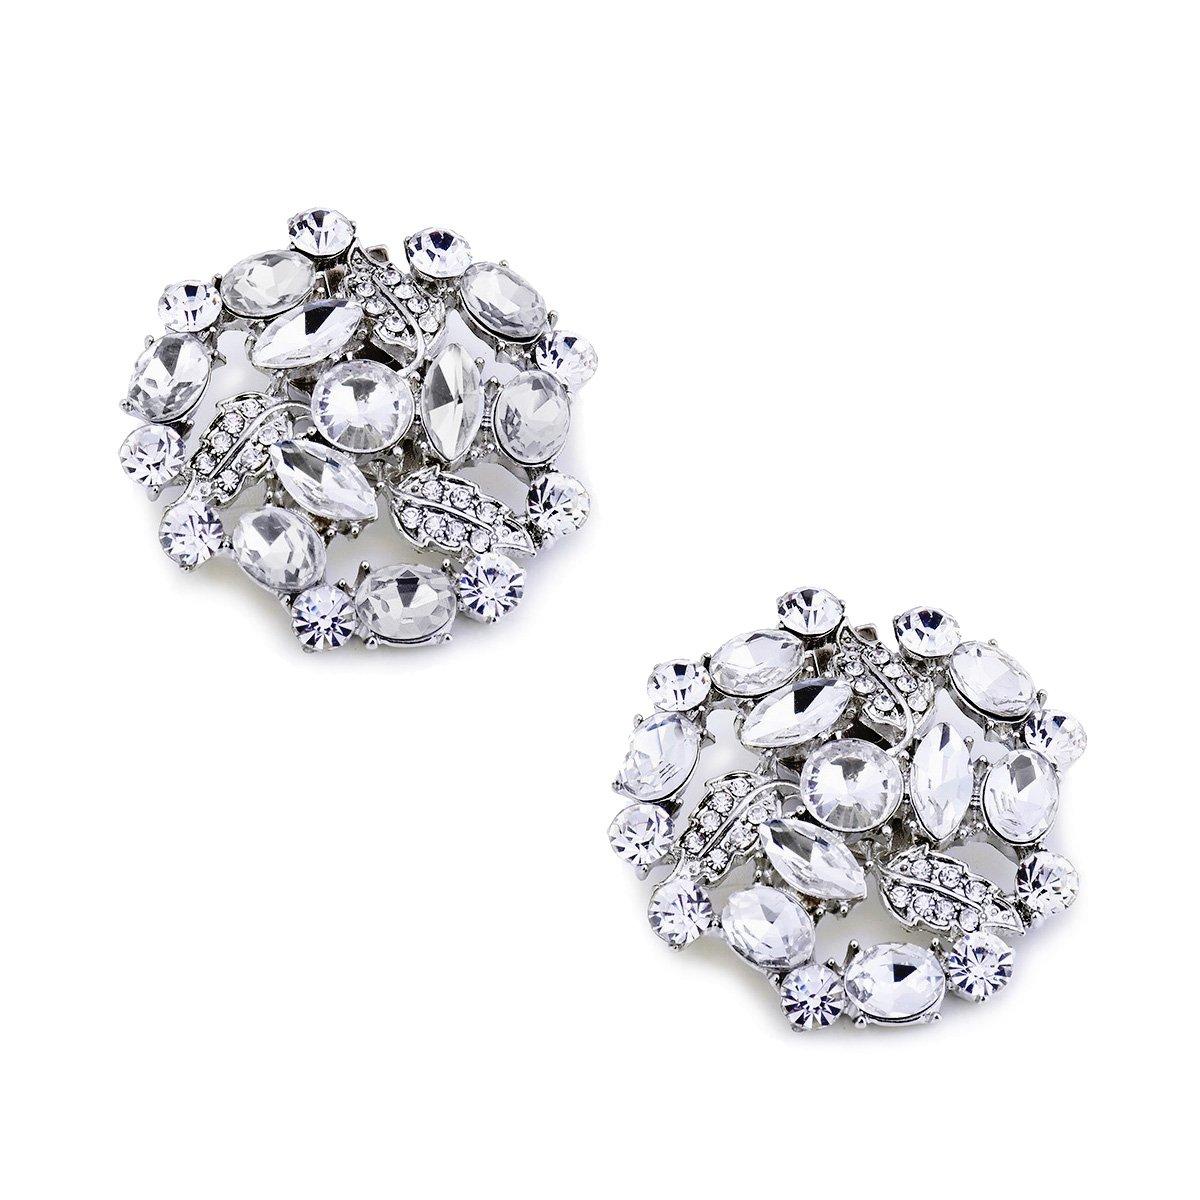 ElegantPark AM Women Rhinestones Decoration Wedding Party Shoe Clips 2 Pcs Silver